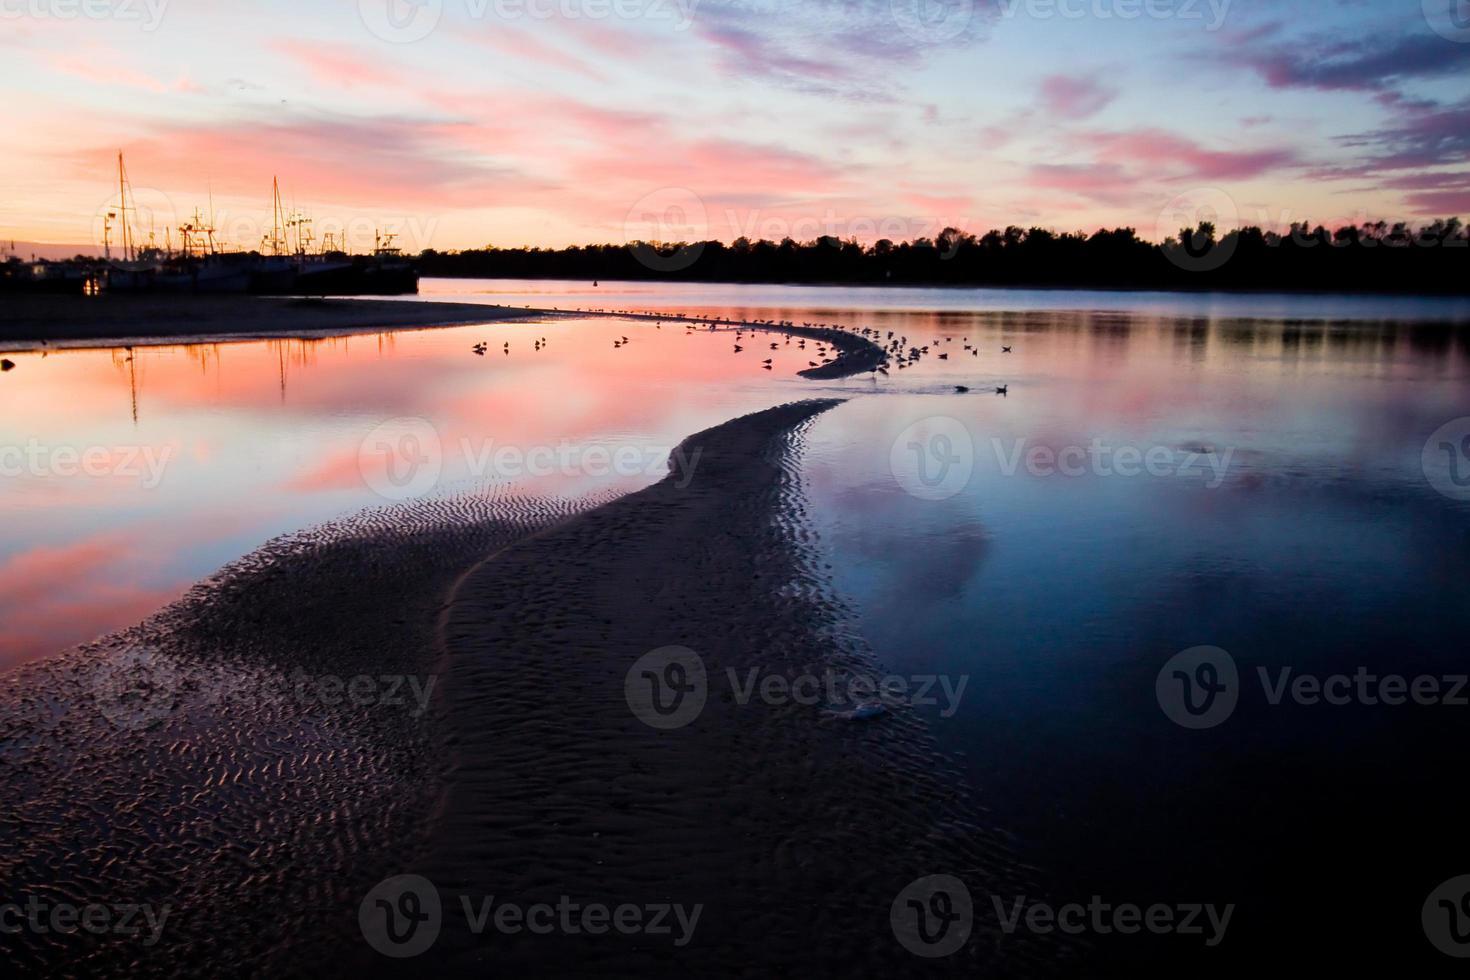 Sonnenaufgang am Eingang des Sees foto